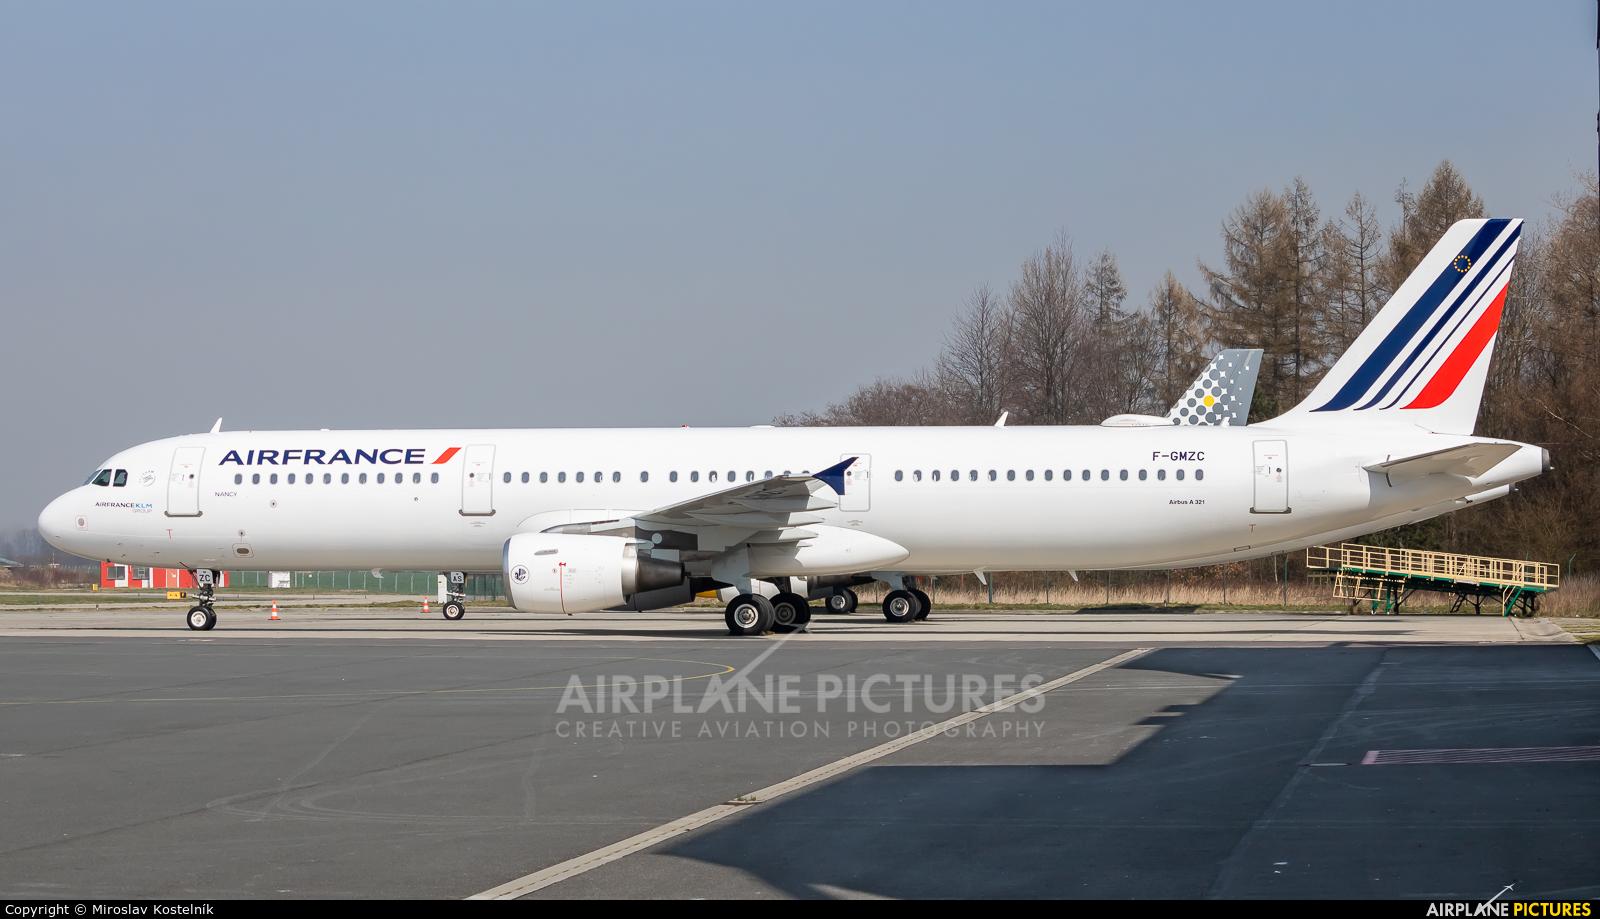 Air France F-GMZC aircraft at Ostrava Mošnov